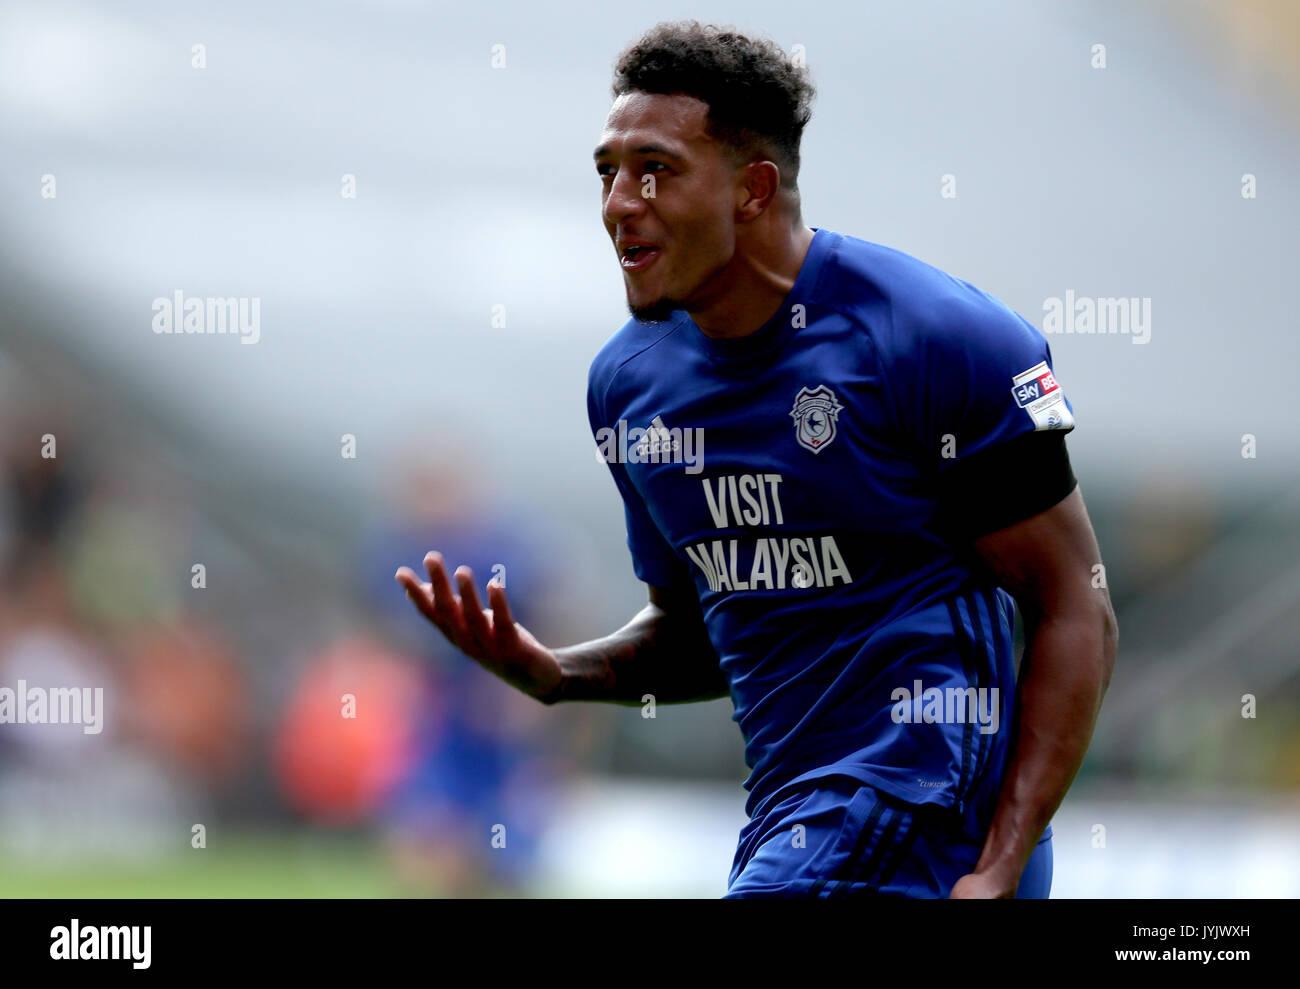 Cardiff City s Nathaniel Mendez Laing celebrates scoring his side s